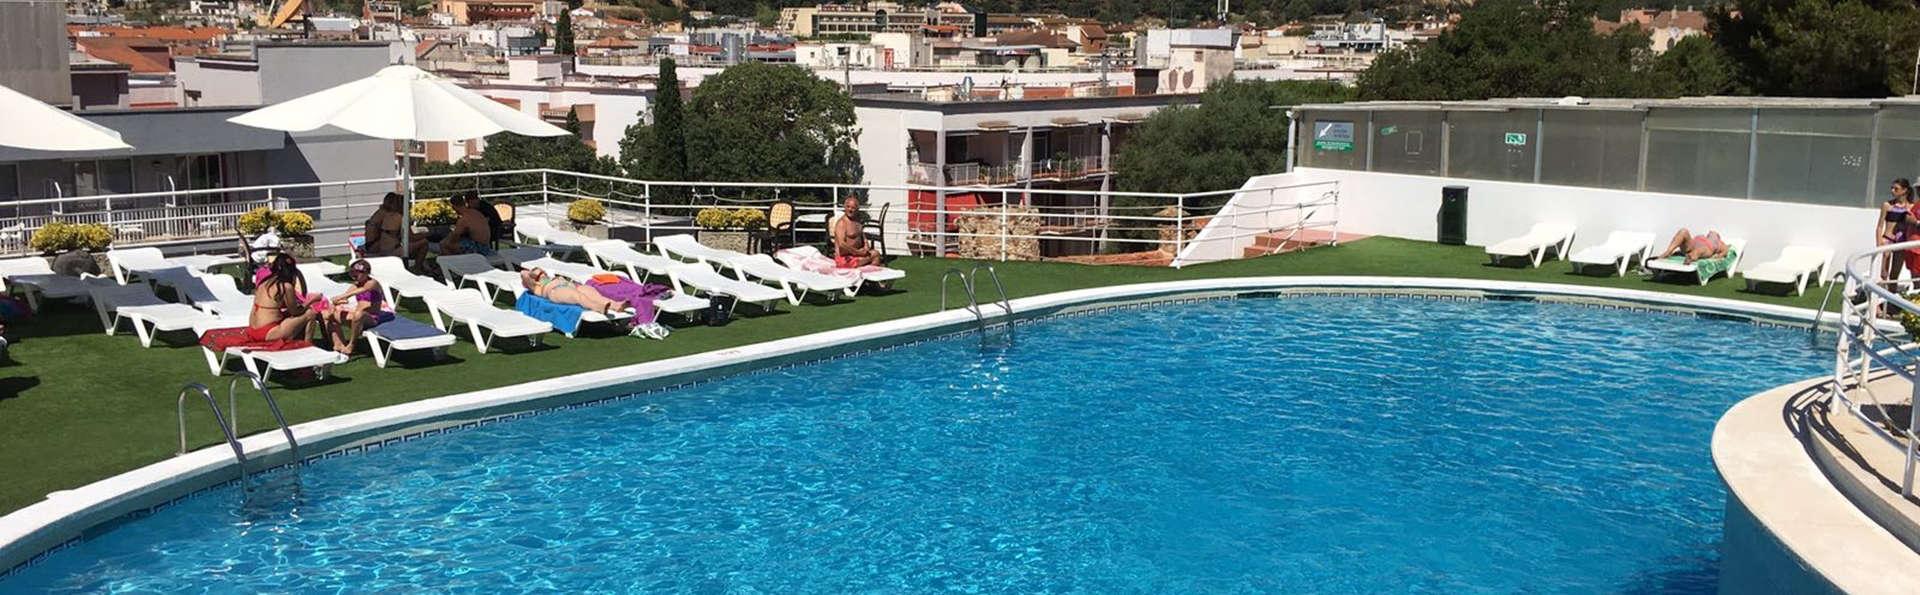 Hotel Don Juan Tossa - Edit_Pool.jpg